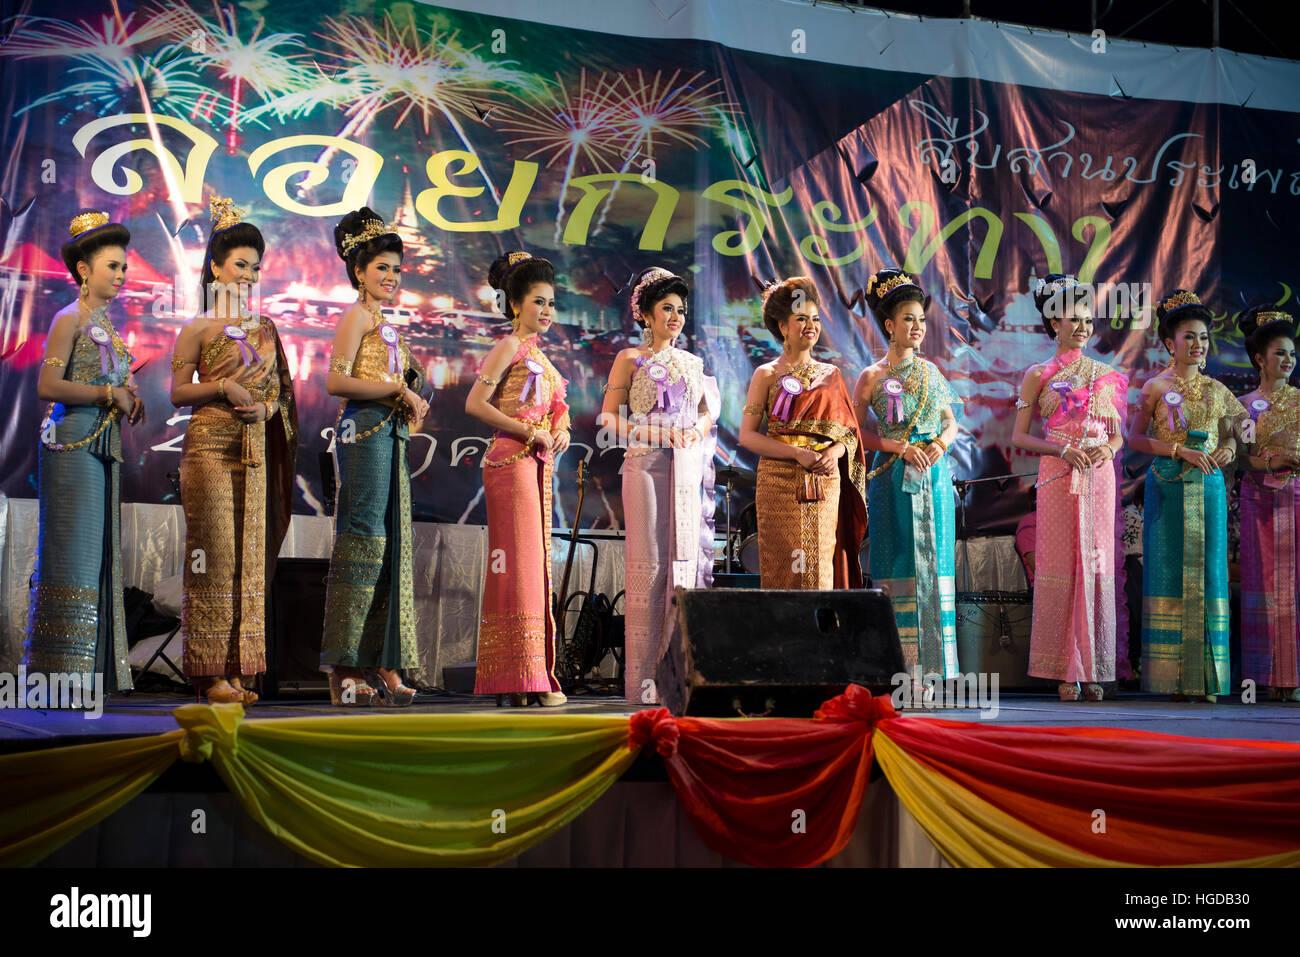 Thailand, Koh Samui, Loy Krathong Festival, Noppamas contest Stock Photo